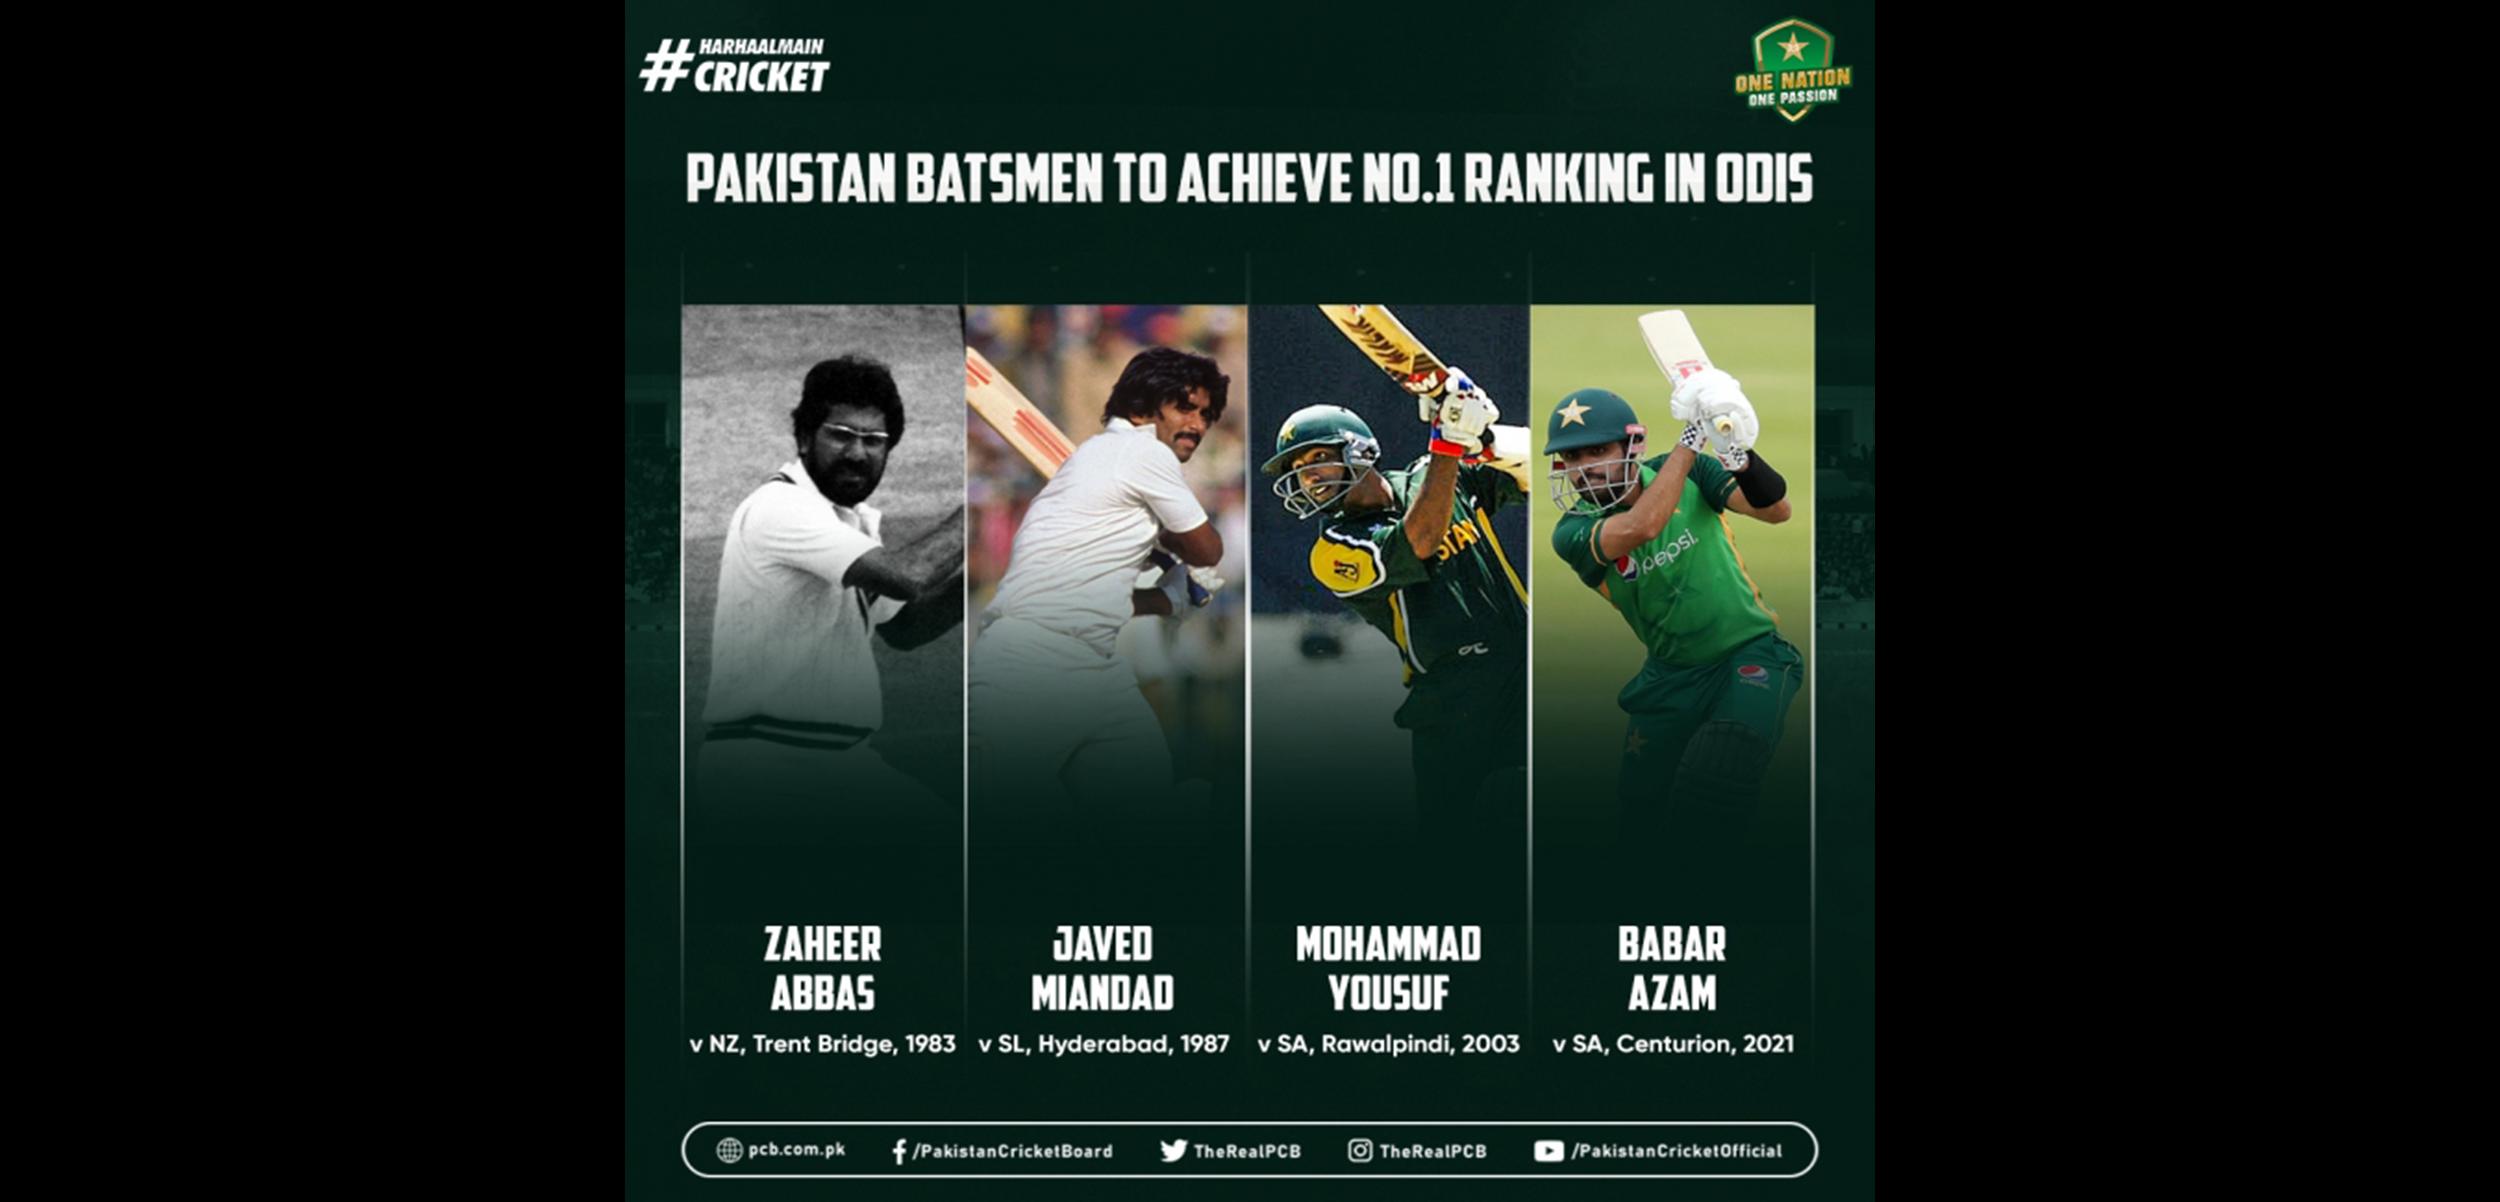 PCB: Babar Azam finishes South Africa ODIs as No.1 ranked batsman